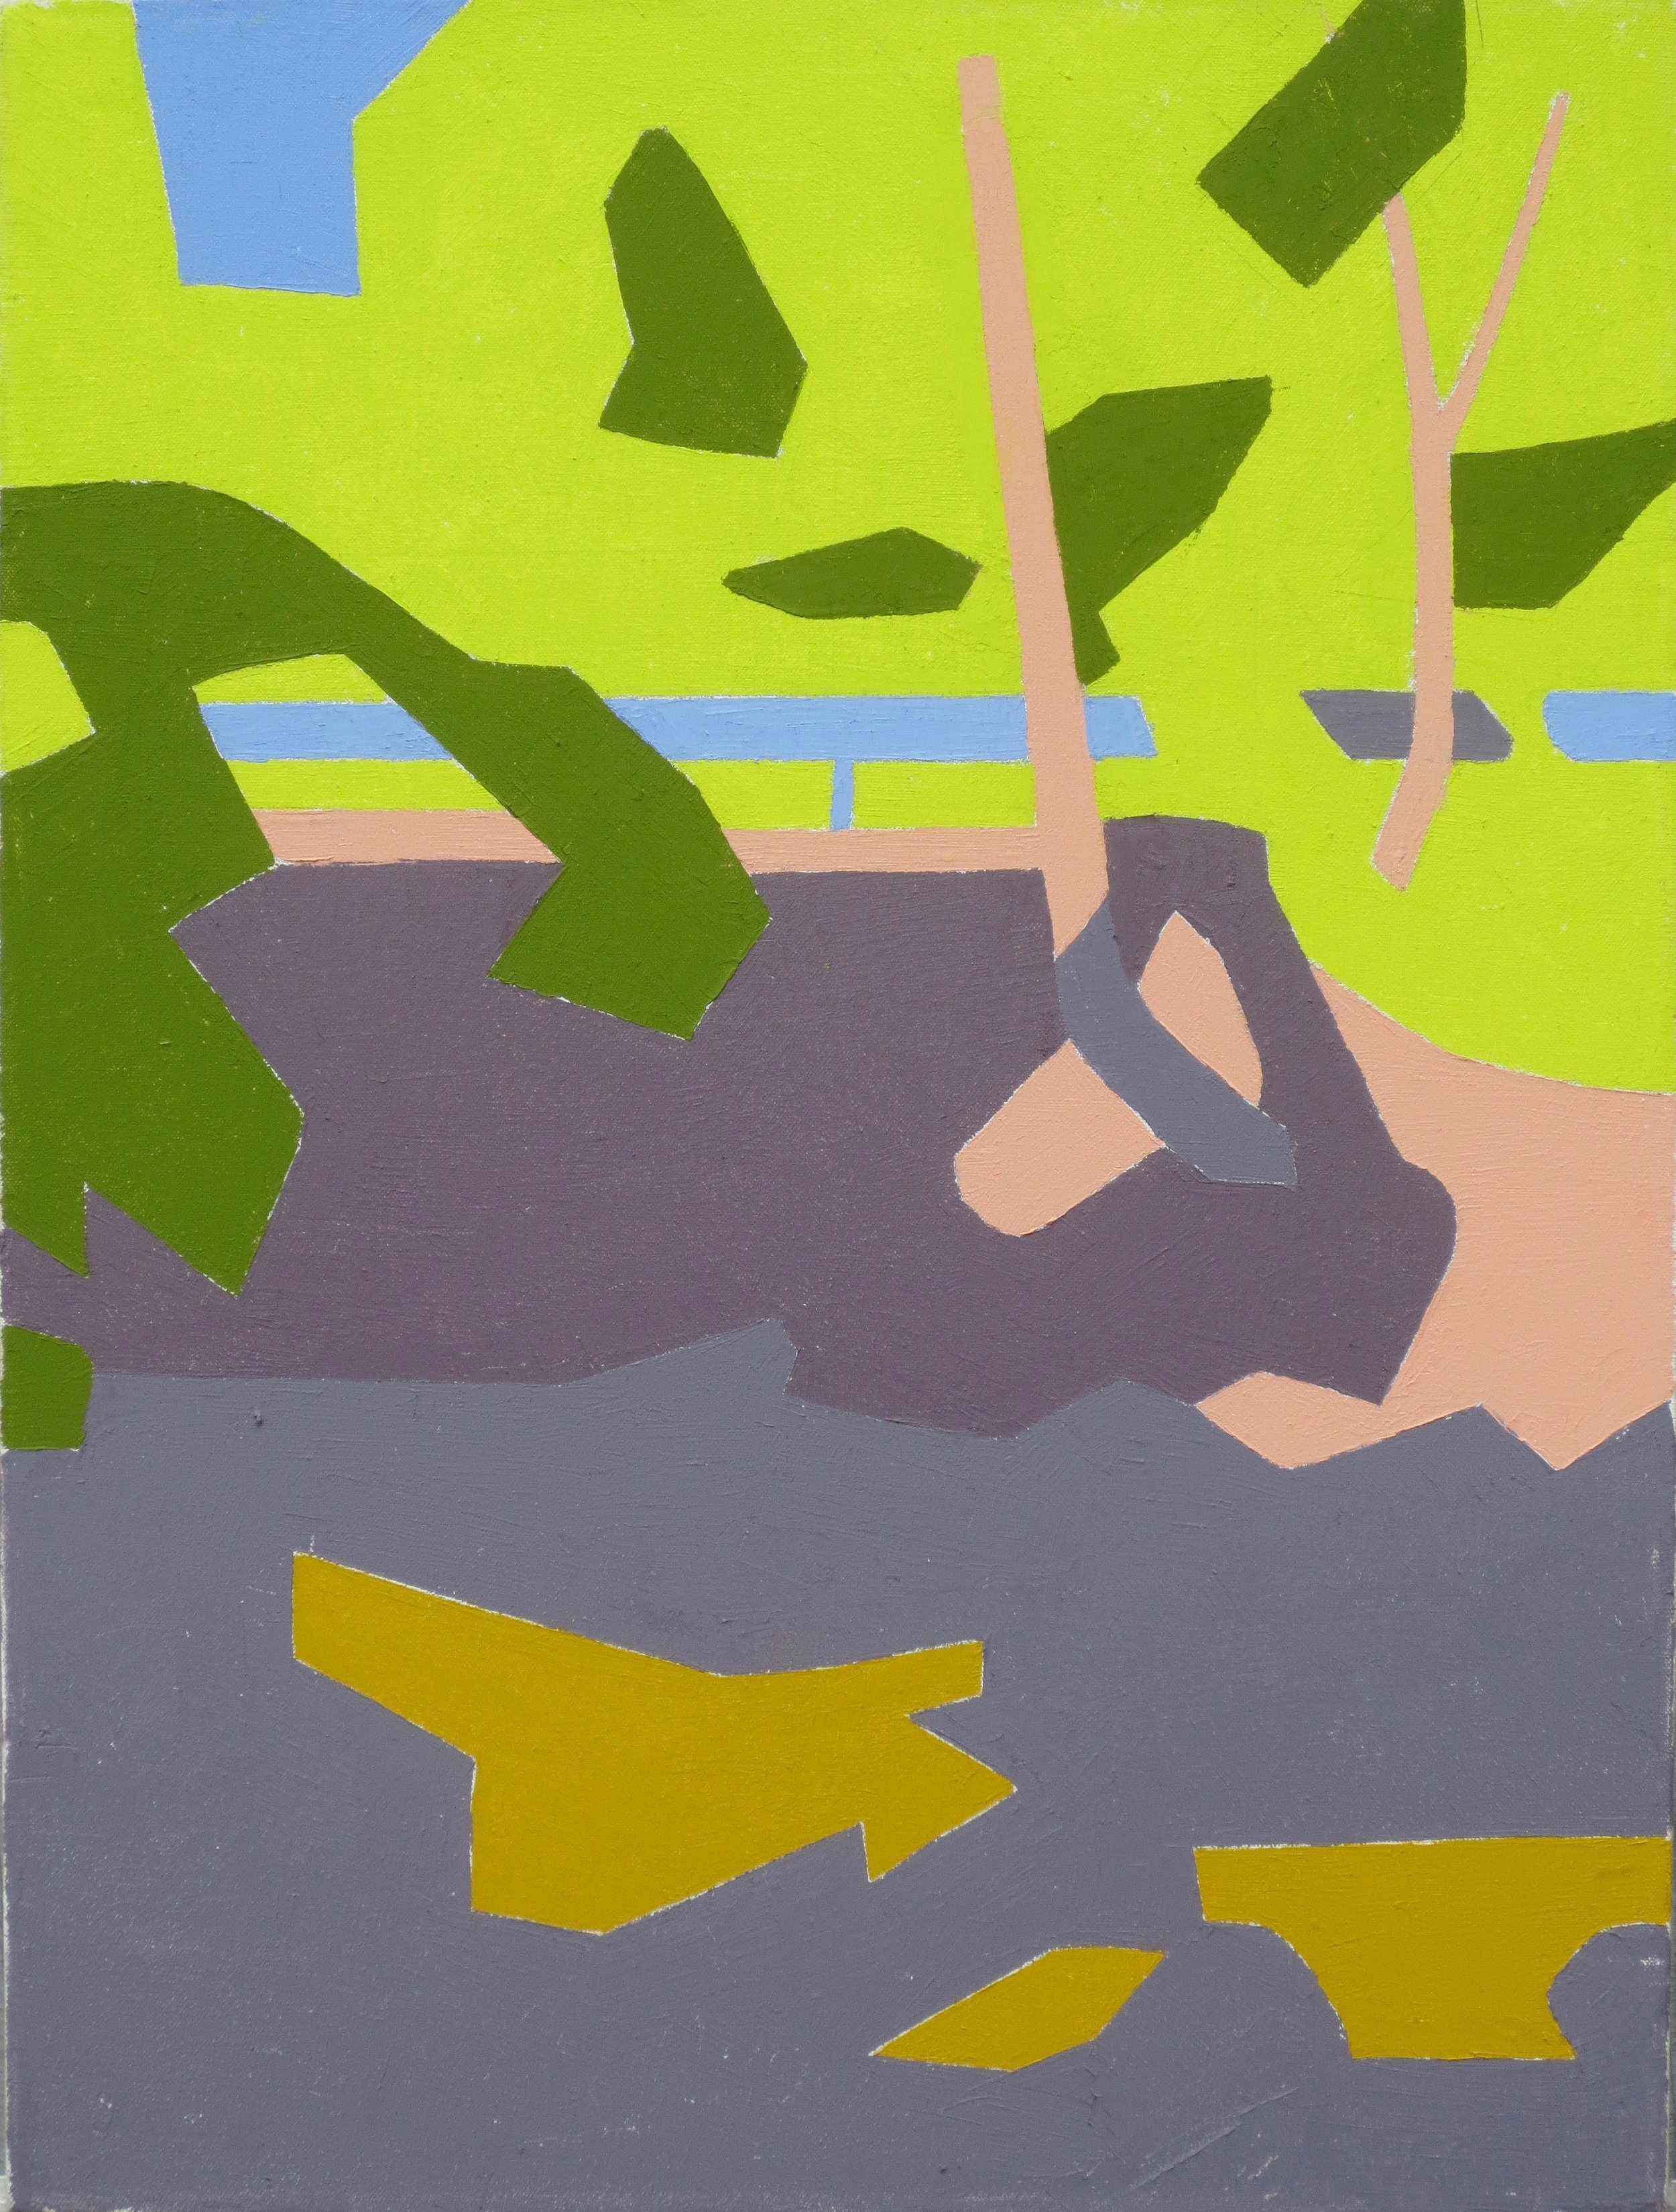 River Shadows, 2016